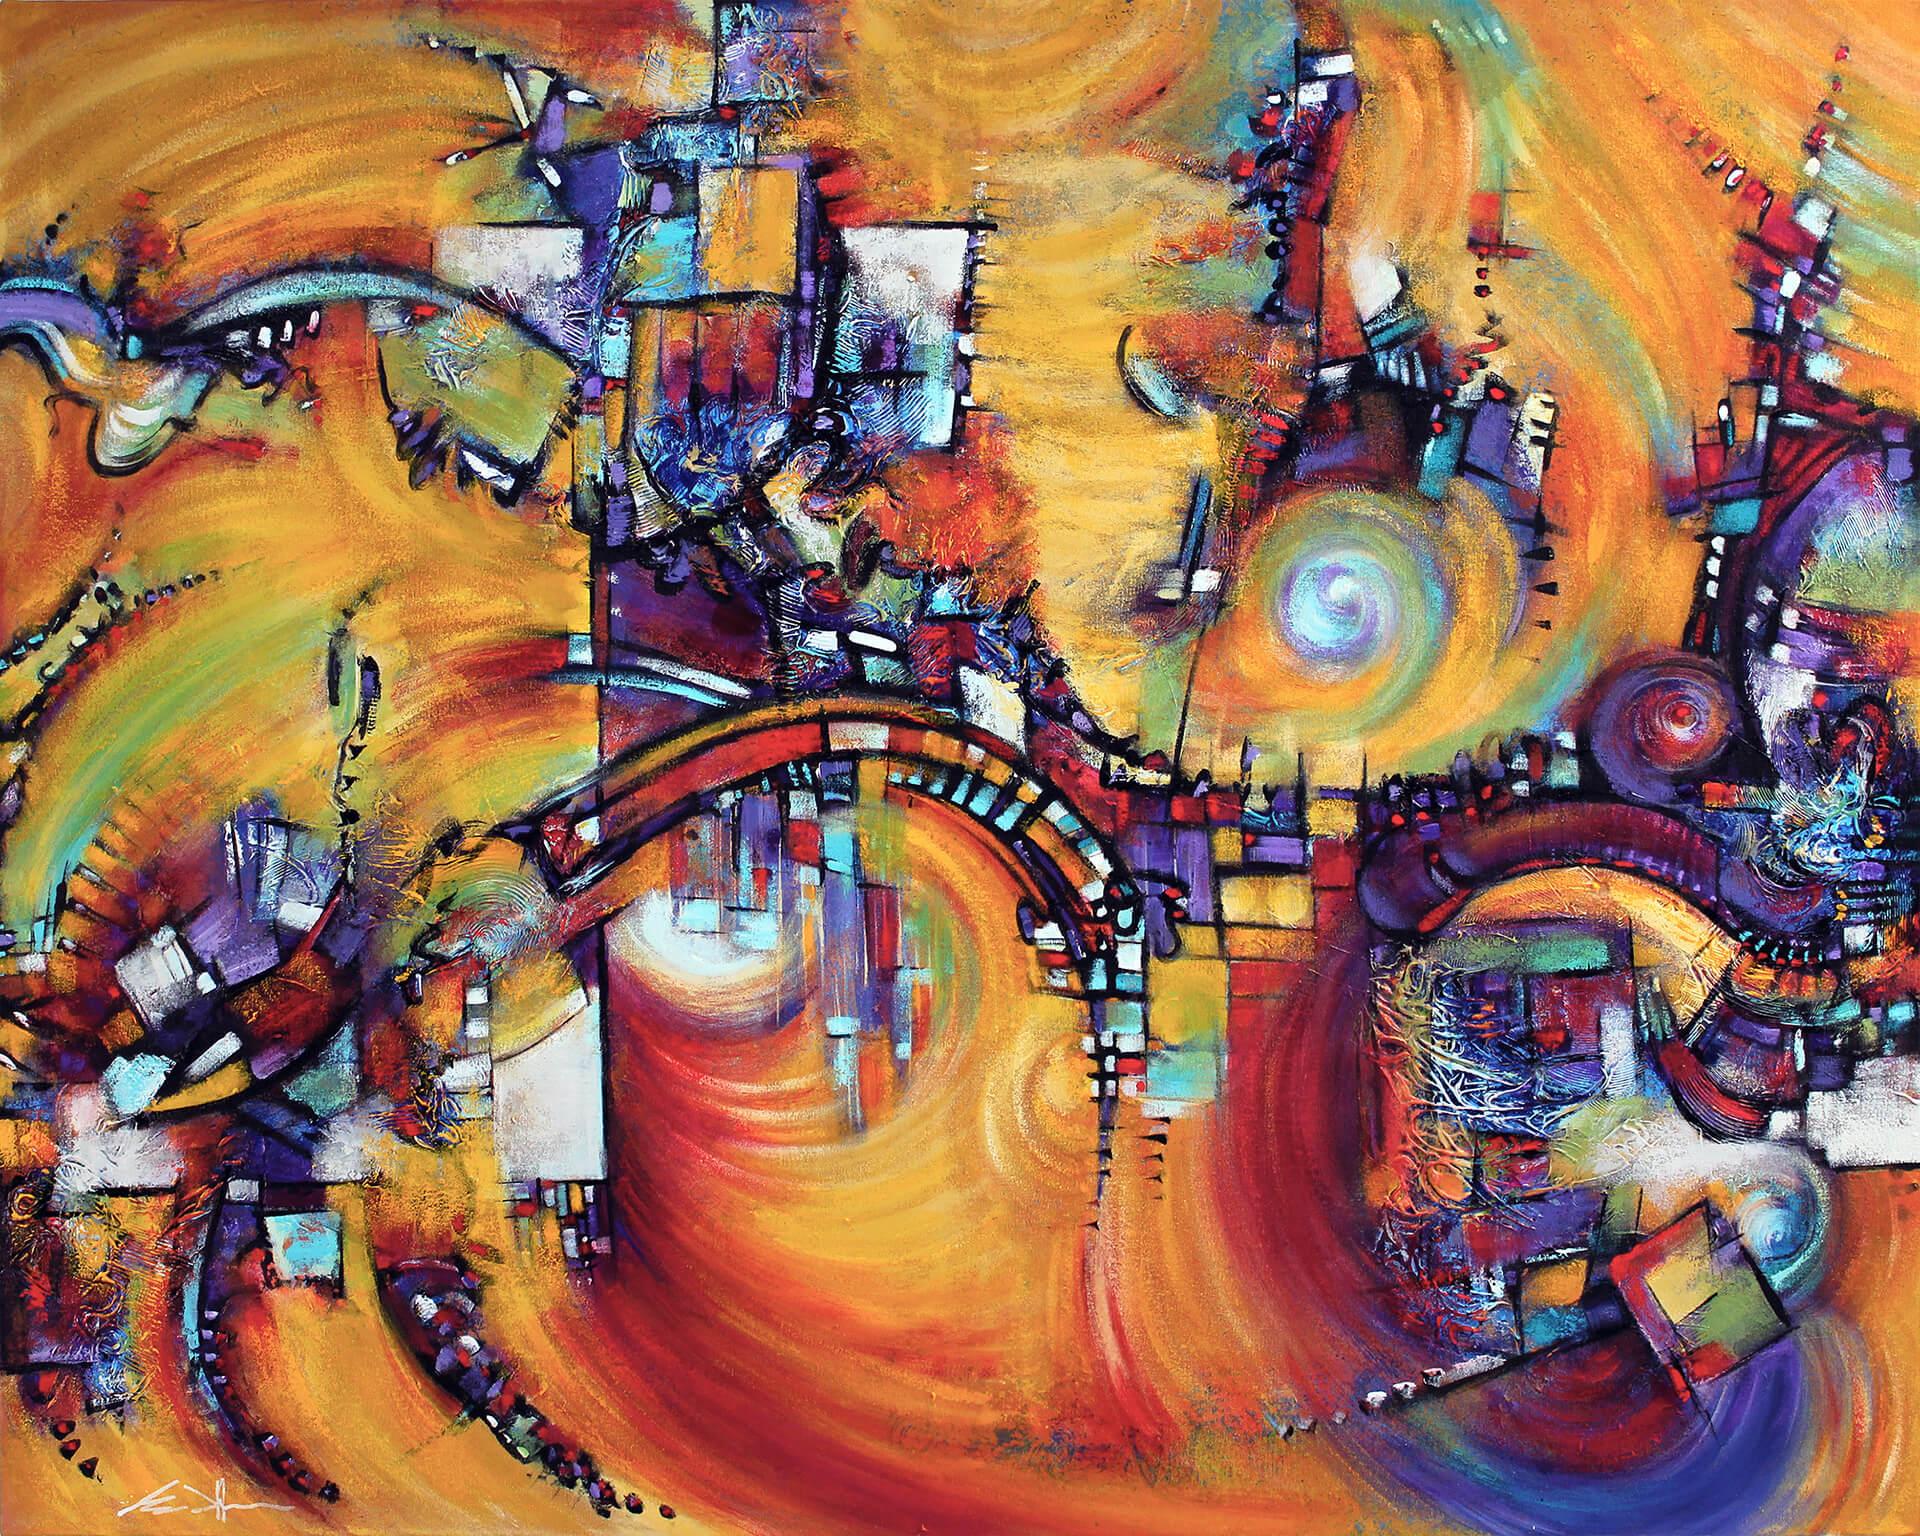 art-eric-j-hughes-artiste-peintre-canadien-tableau-symbiose-genesis